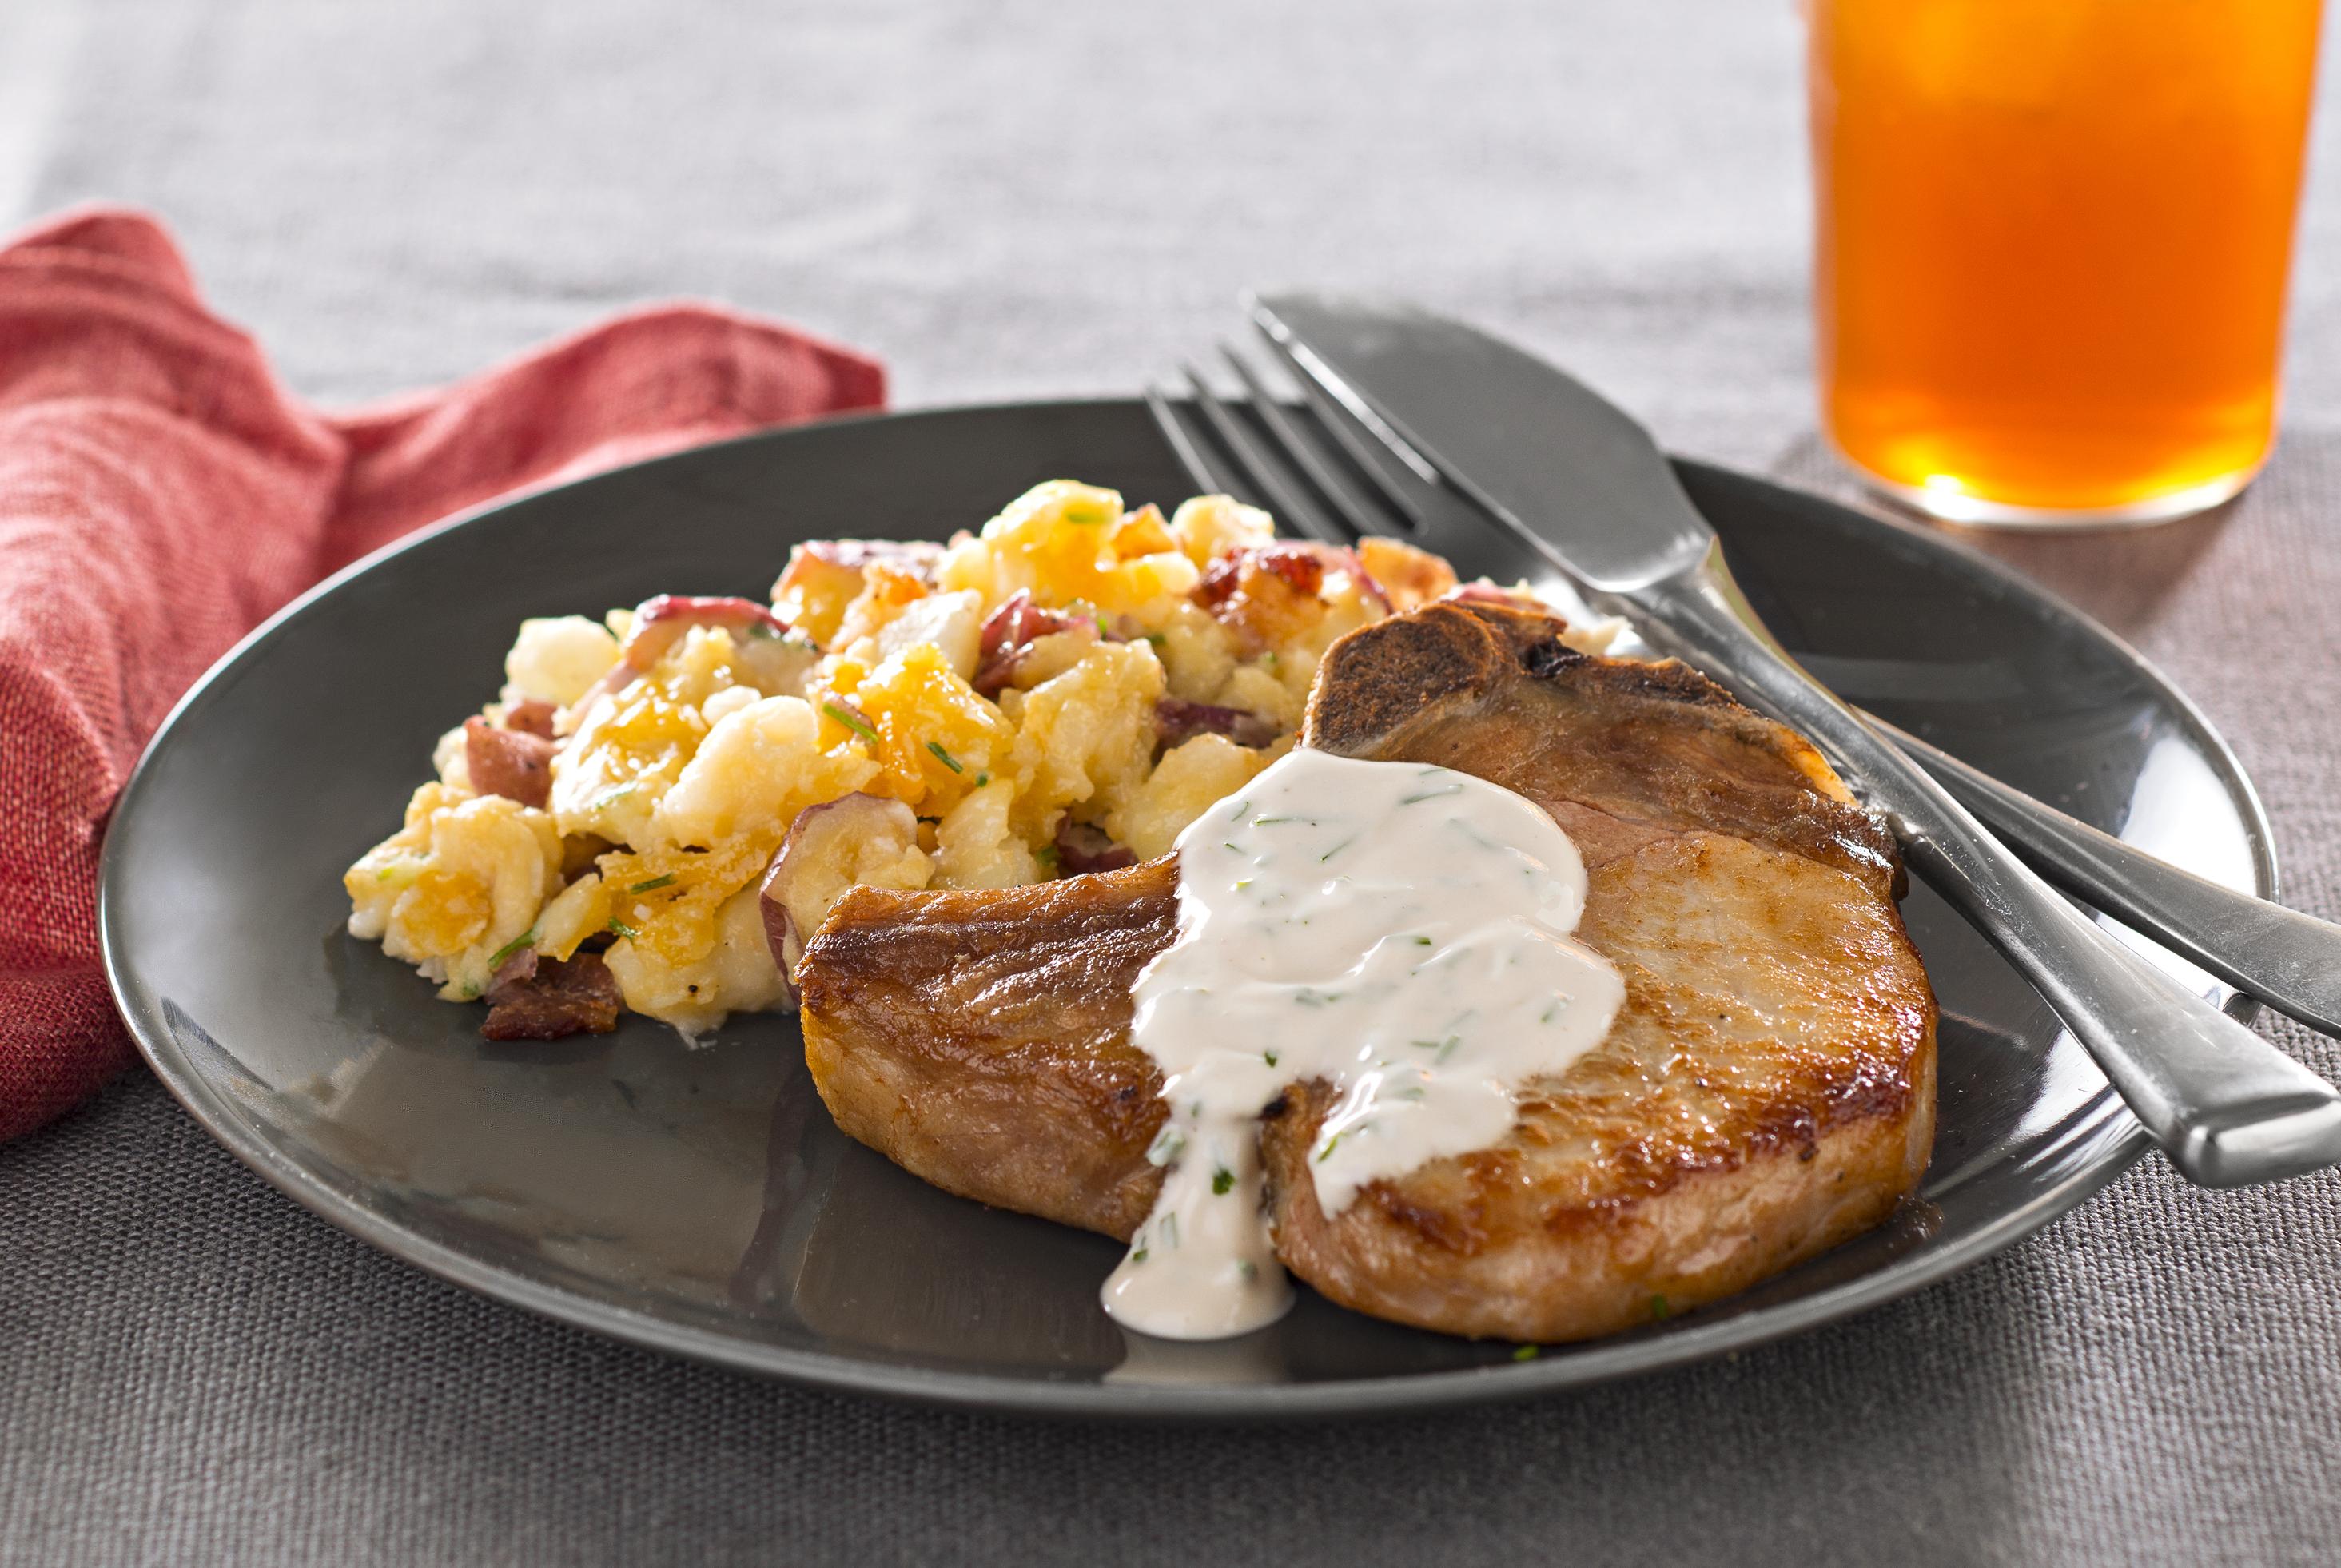 pork-chops-fully-loaded-smashed-potatoes-155074 Image 1